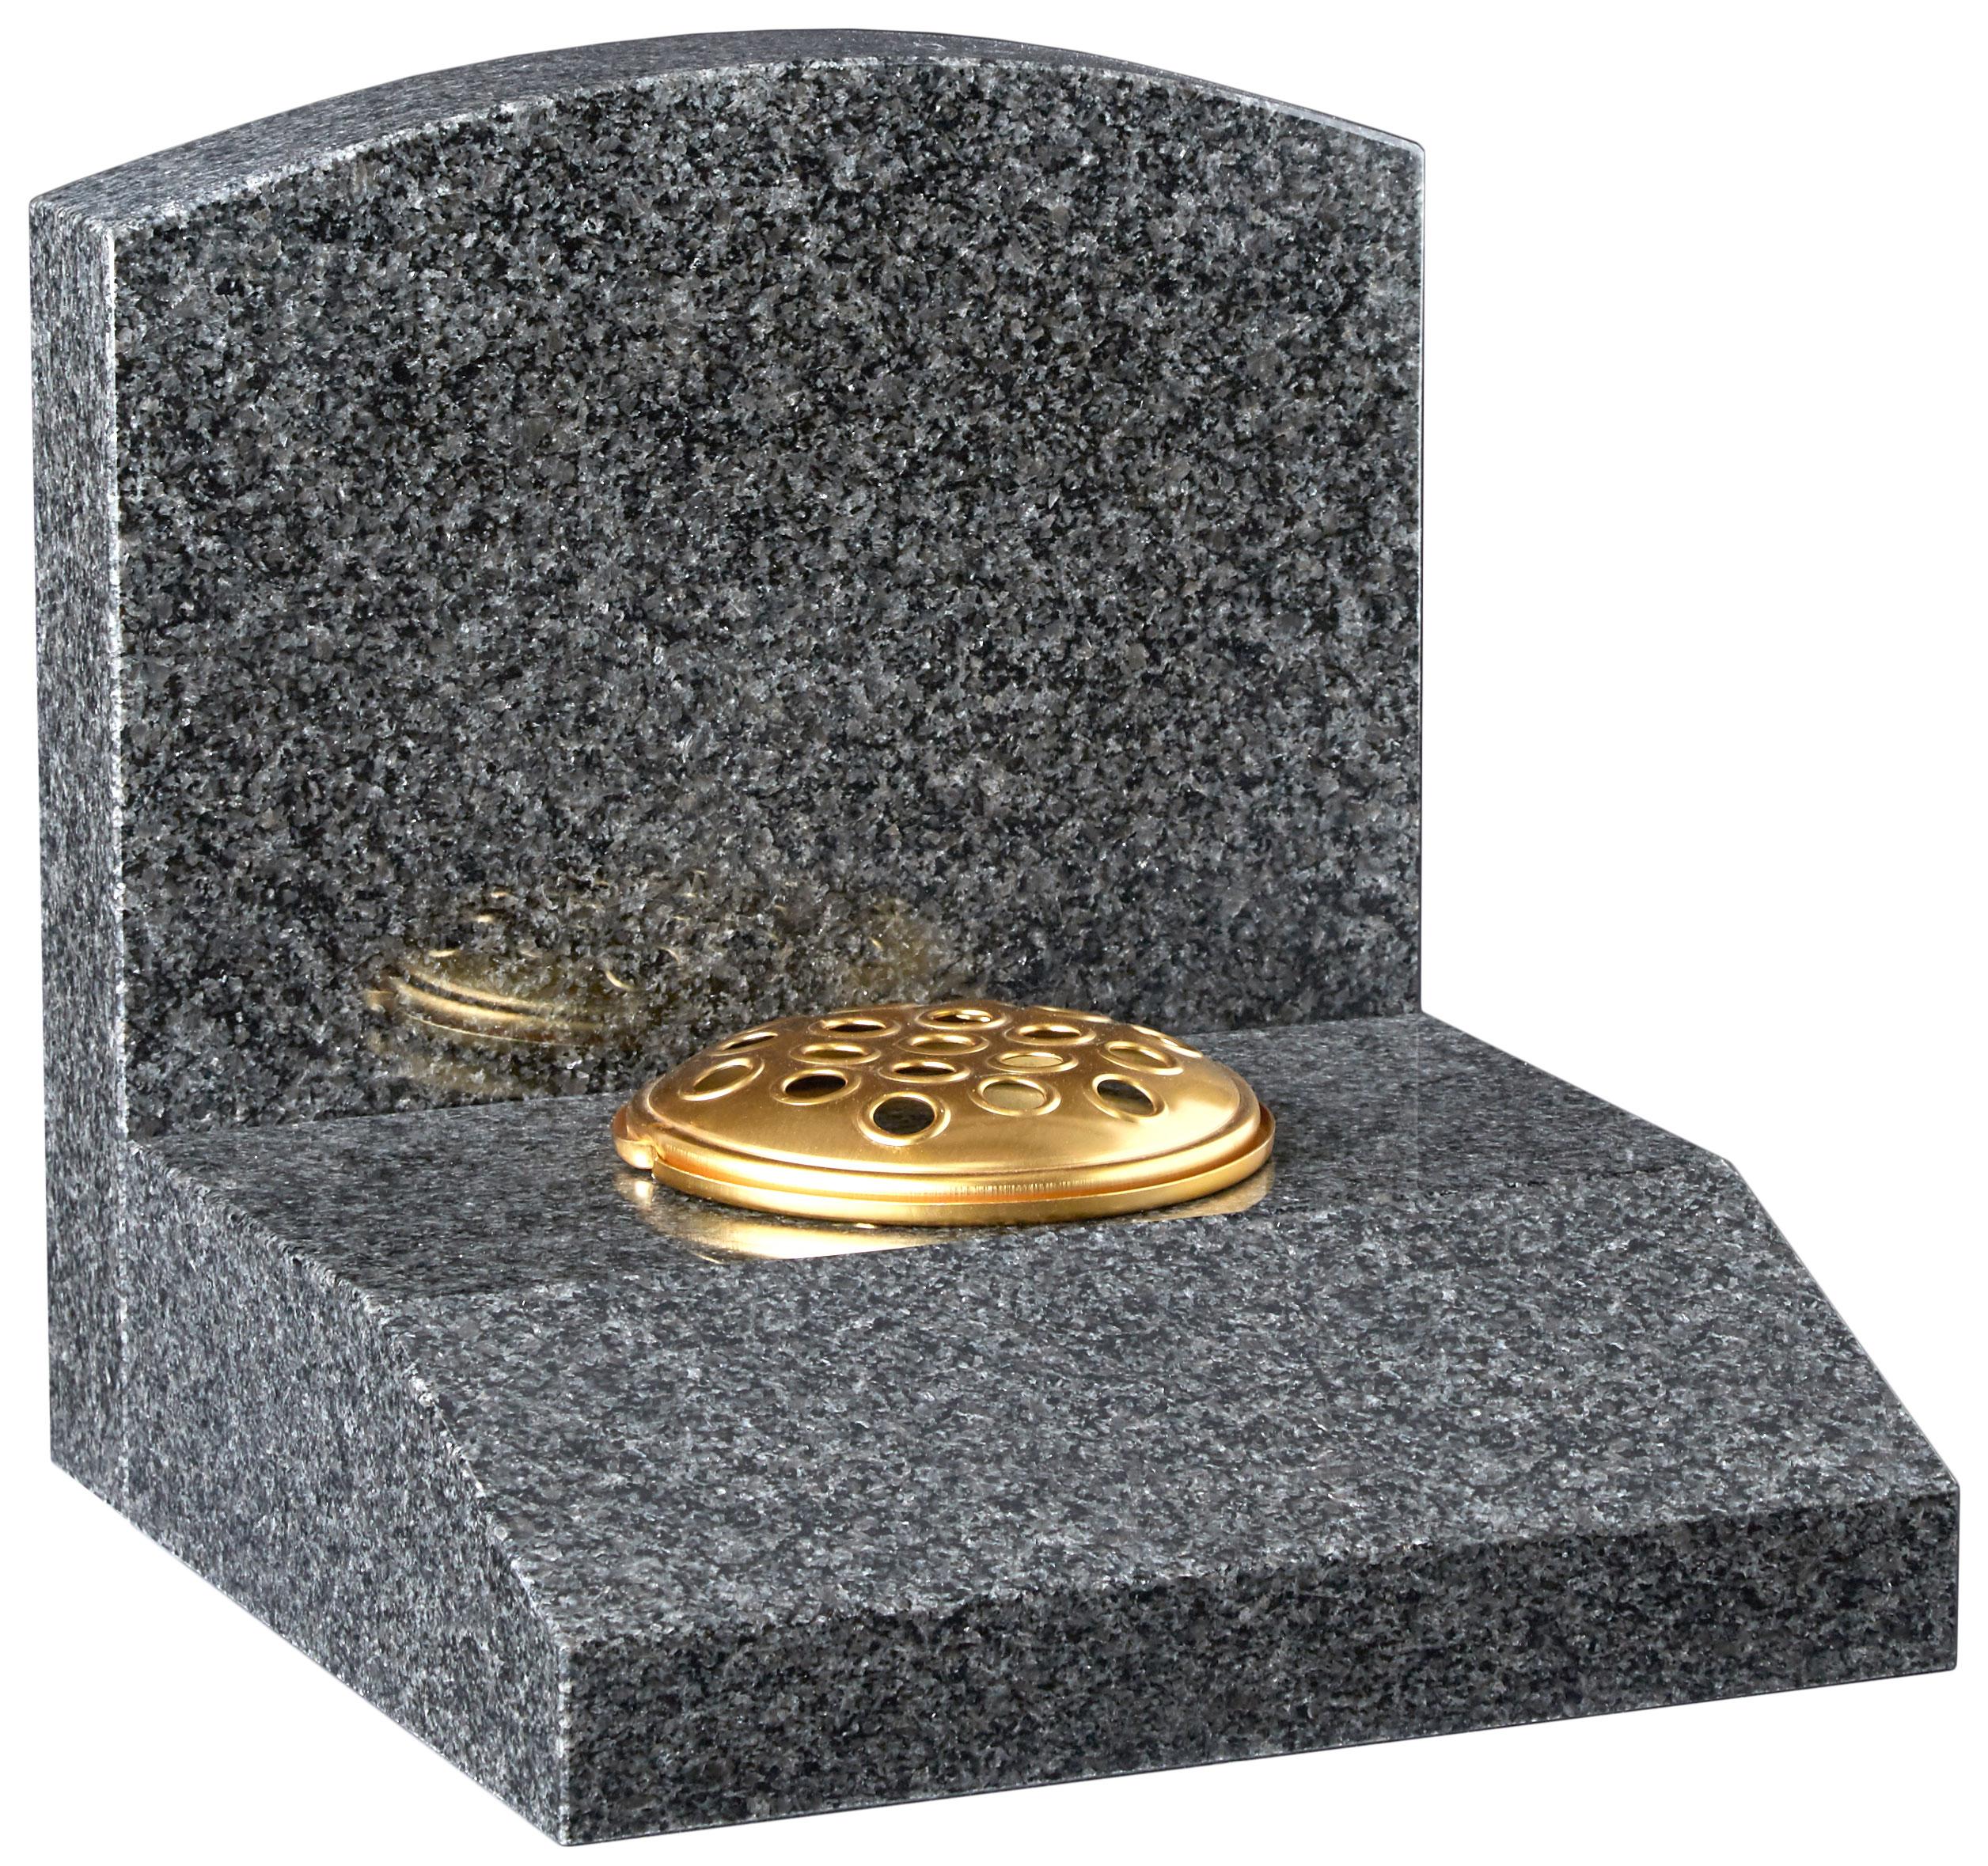 16195 Oval headstone